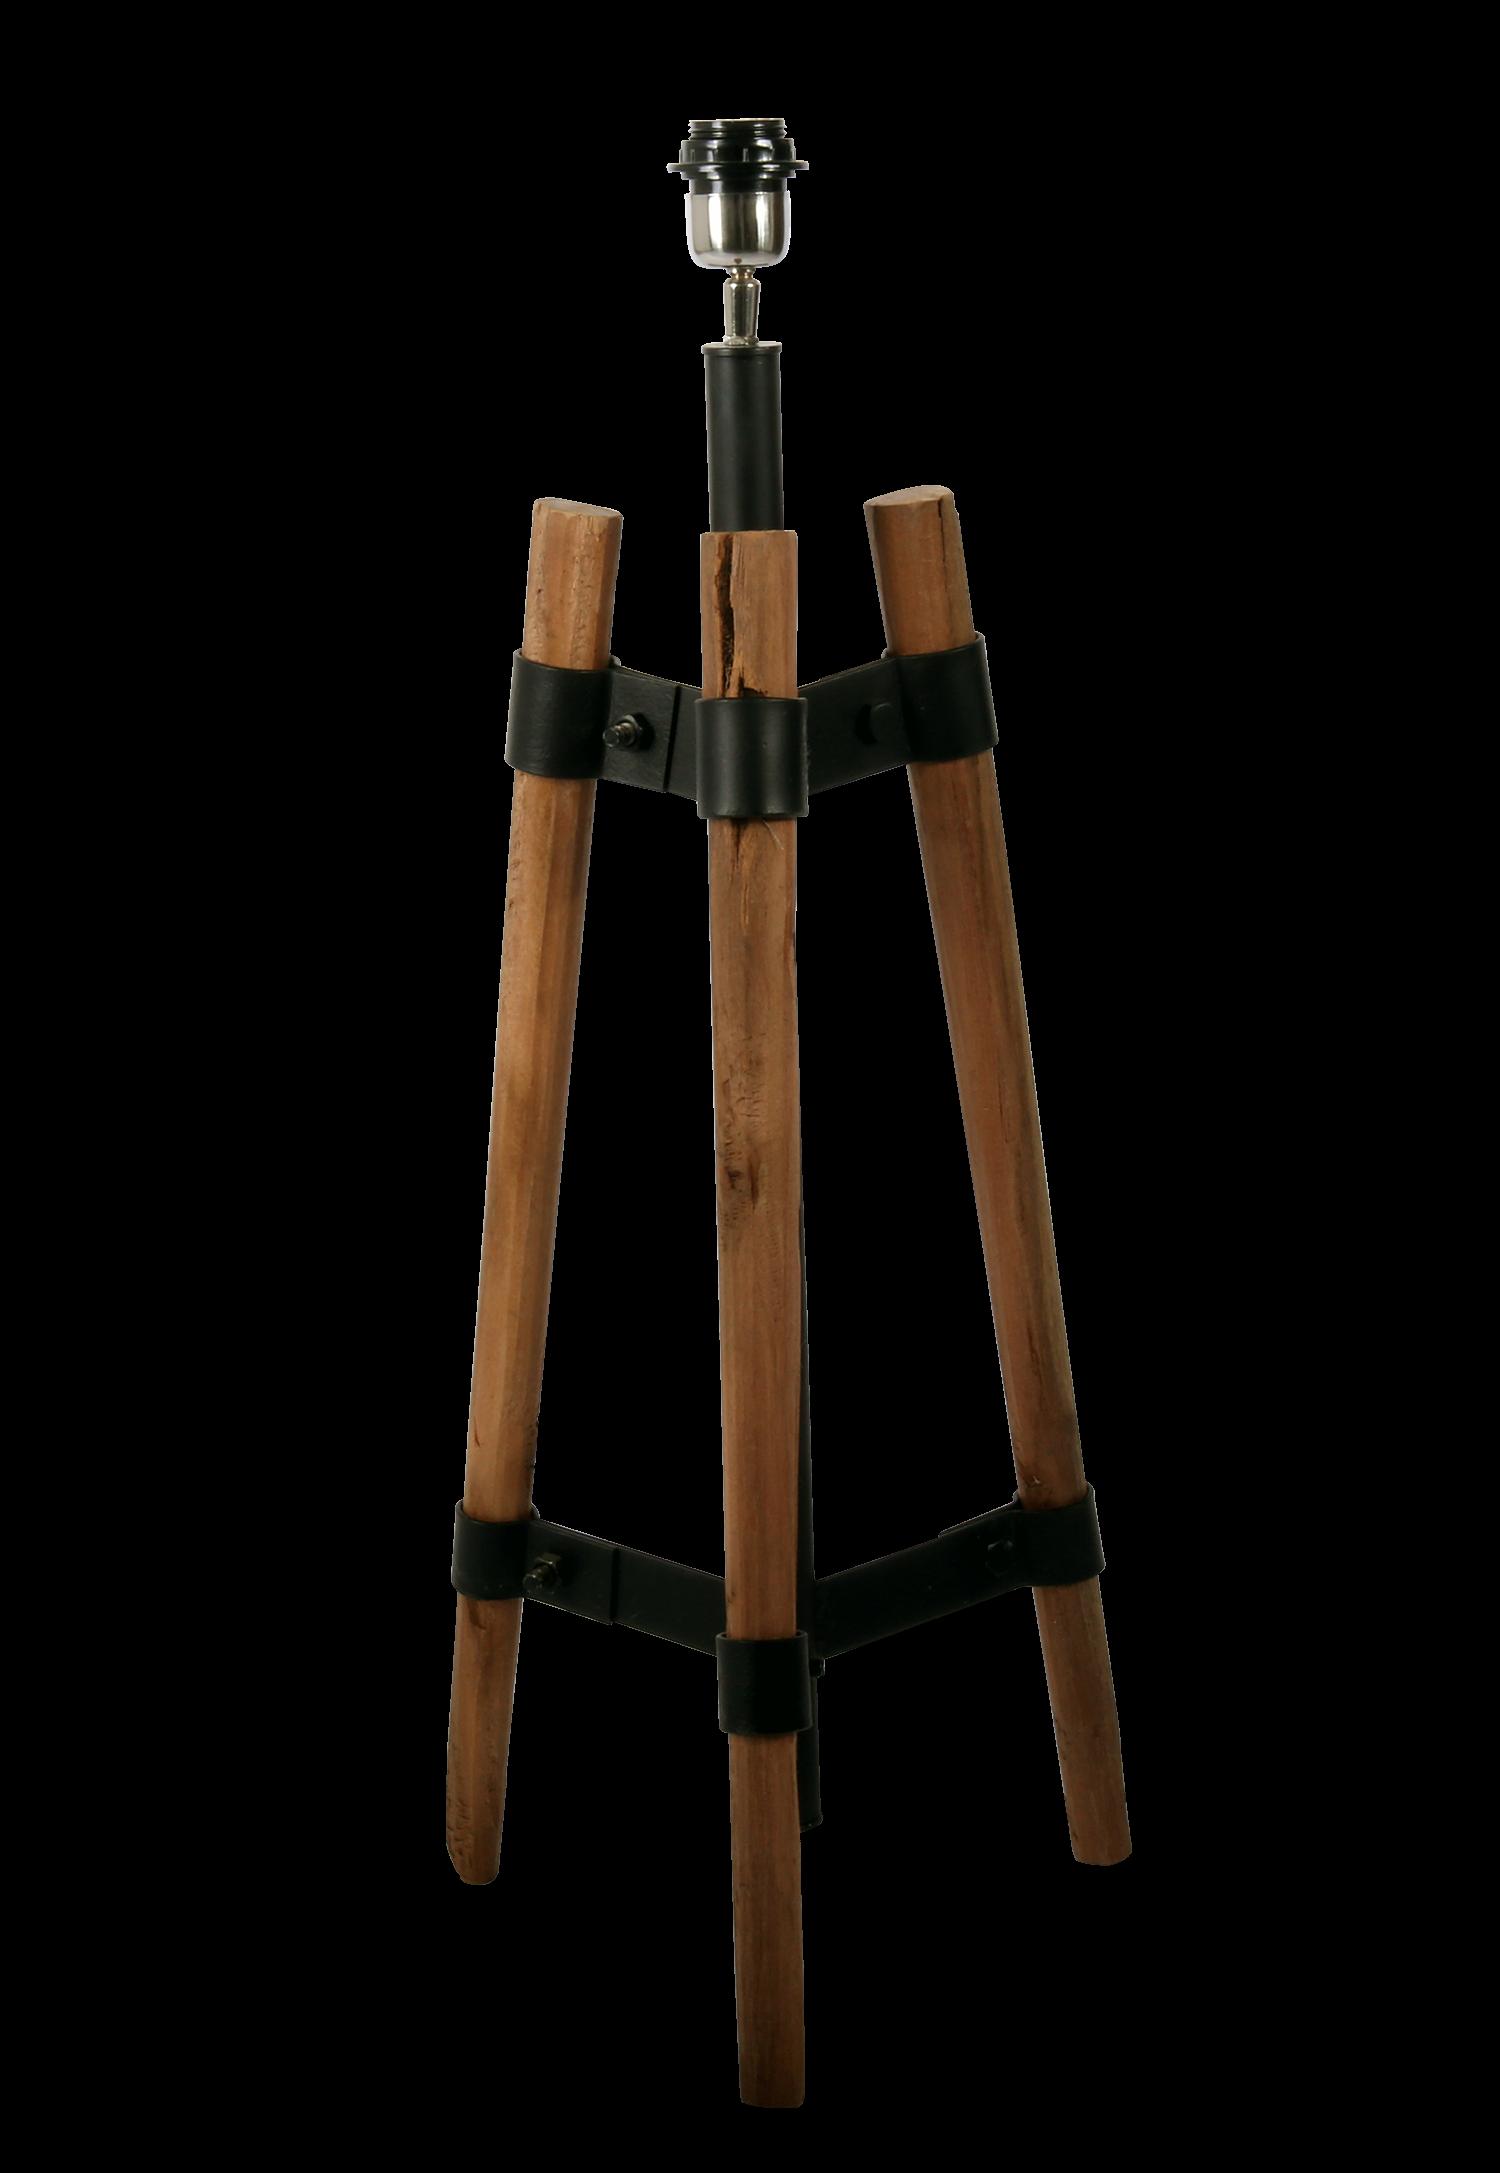 Tafellamp Rivera ruw hout + zwart